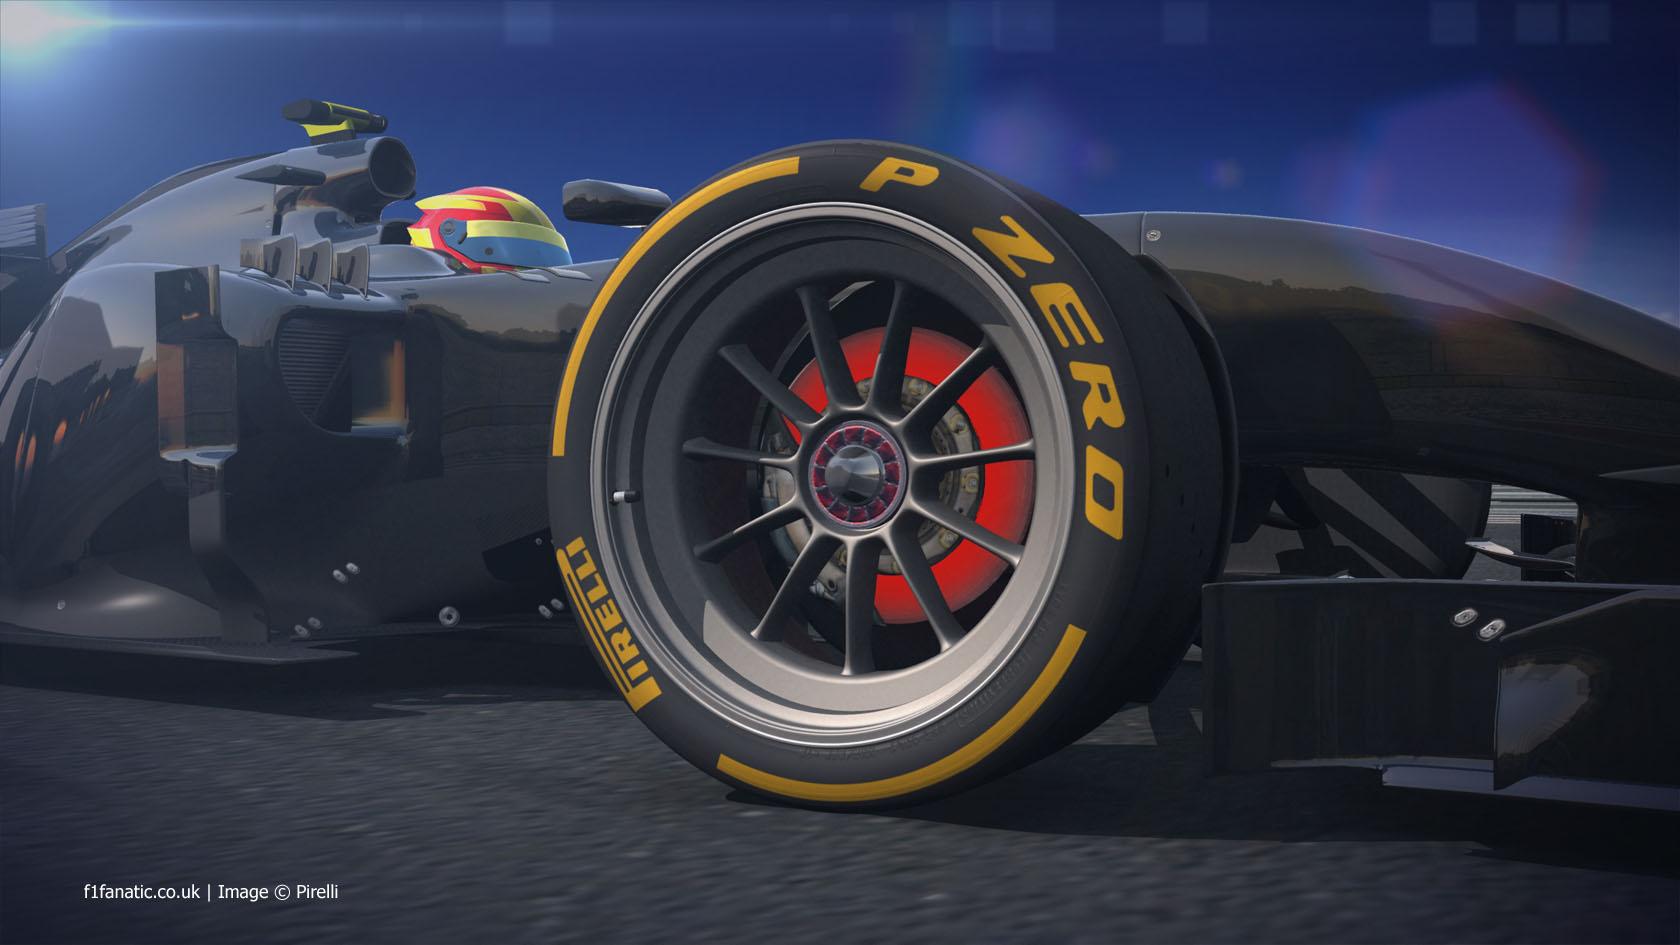 Pirelli 18-inch tyre rendering